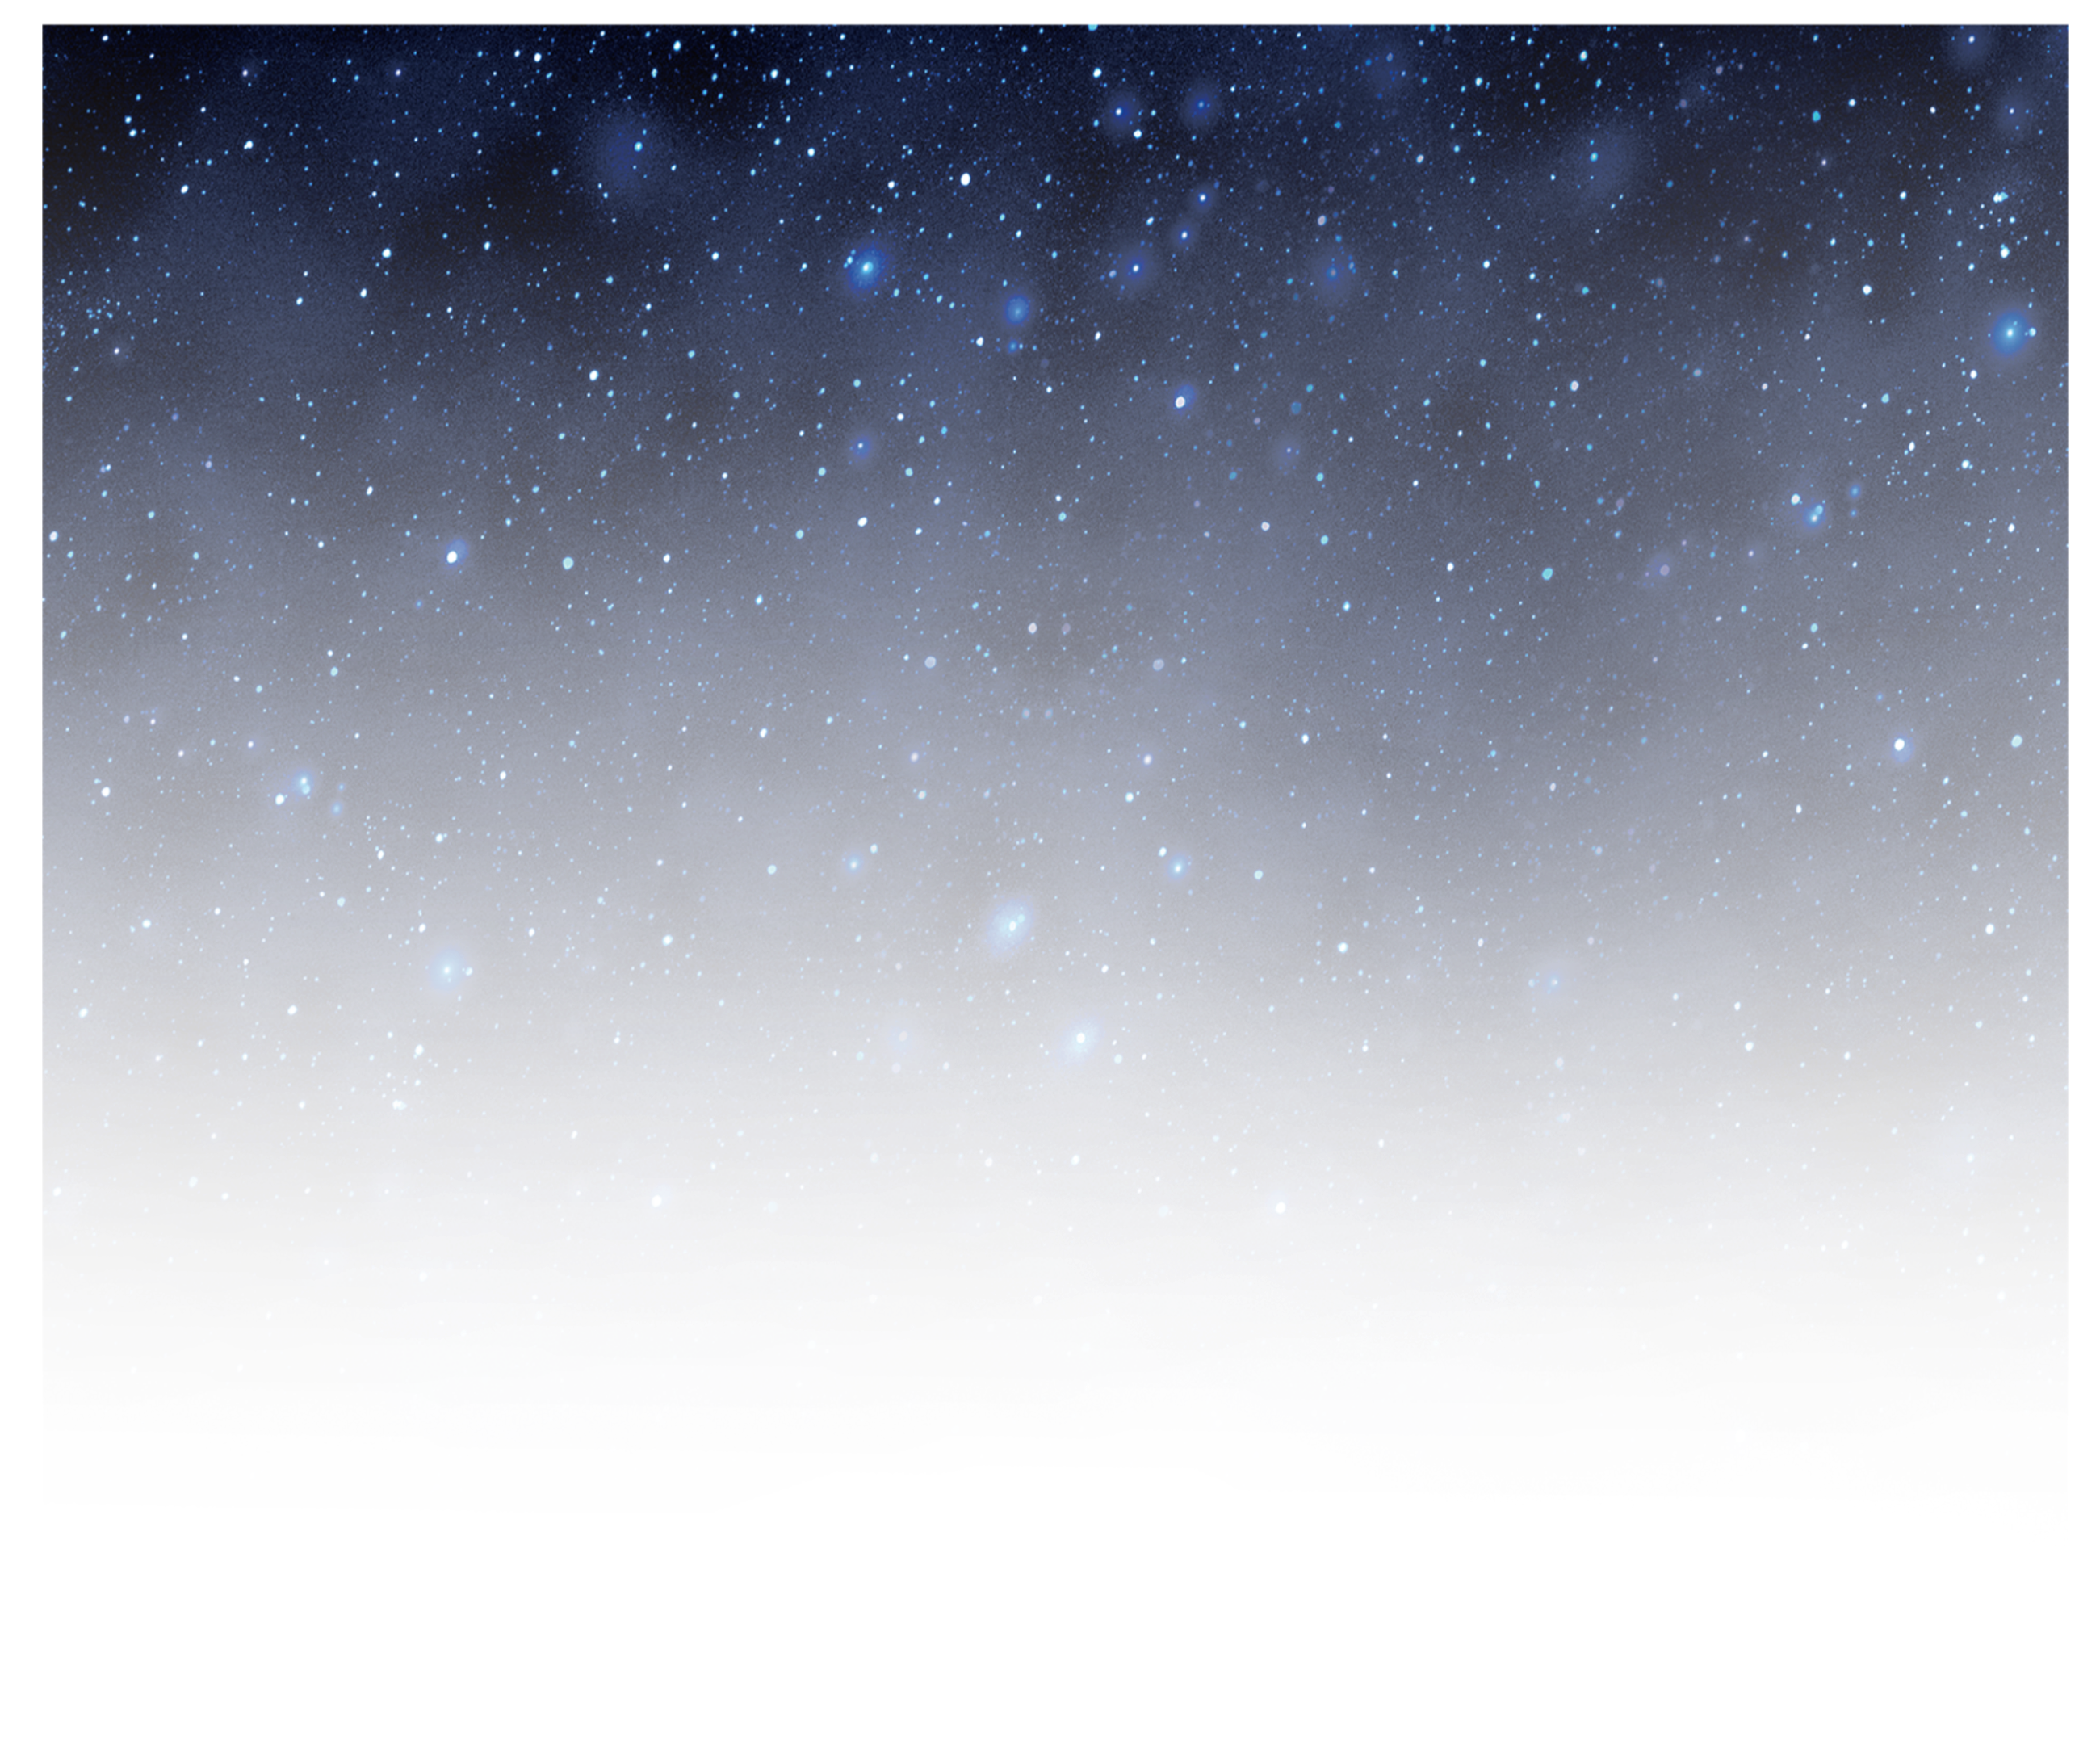 star space transparent - HD1616×1215